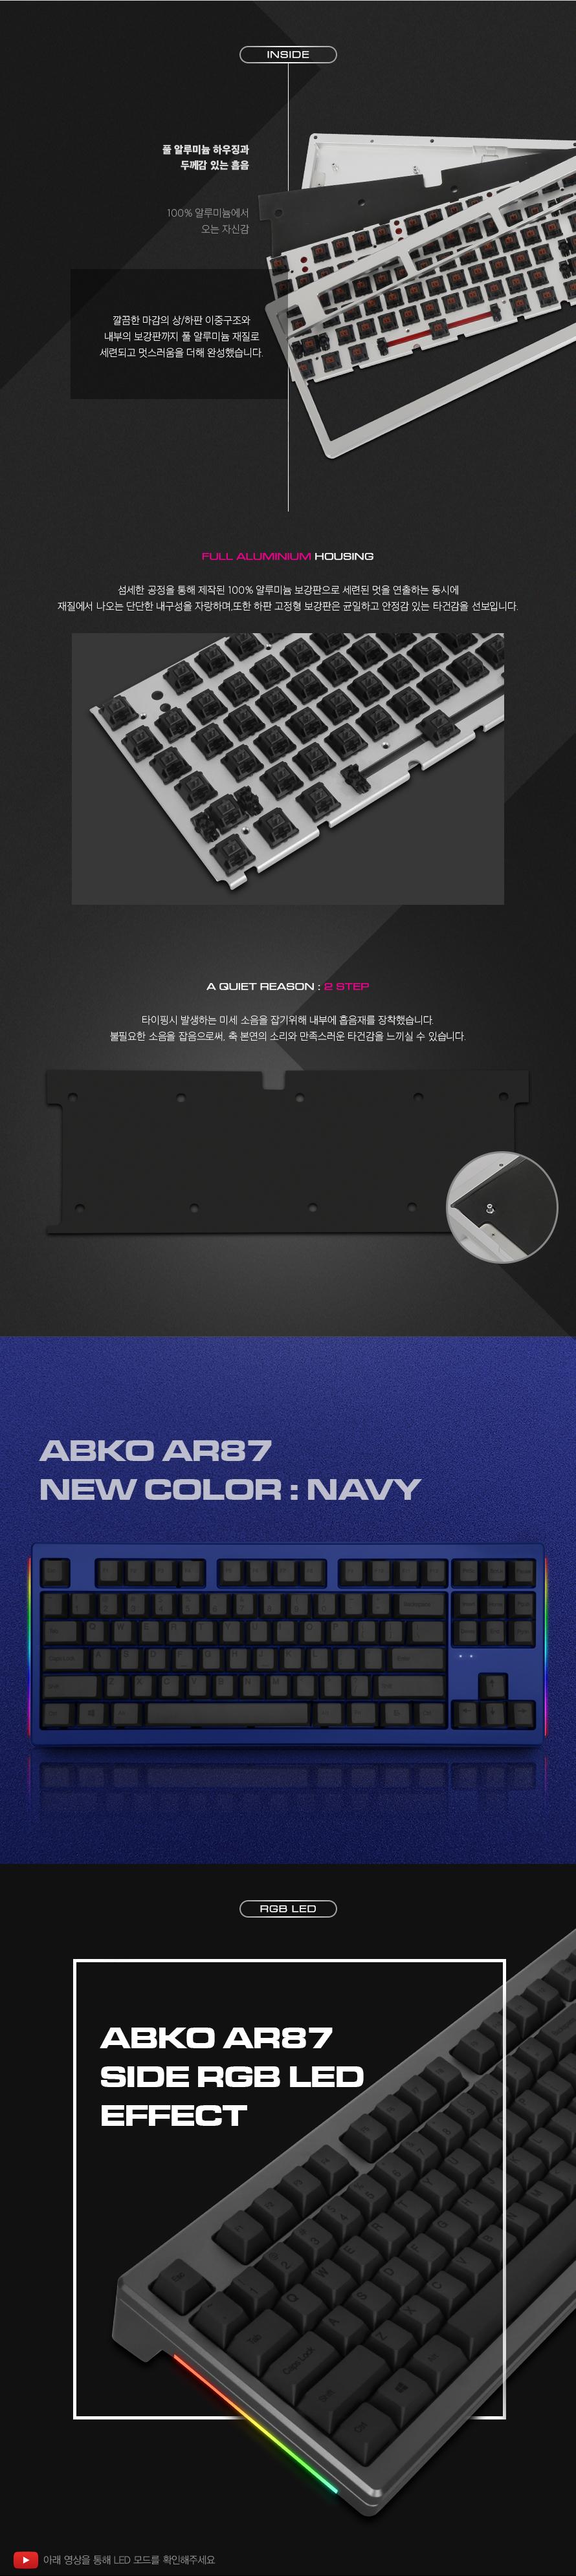 ABKO AR87 CNC 풀 알루미늄 체리키보드 (네이비, 저소음 적축)